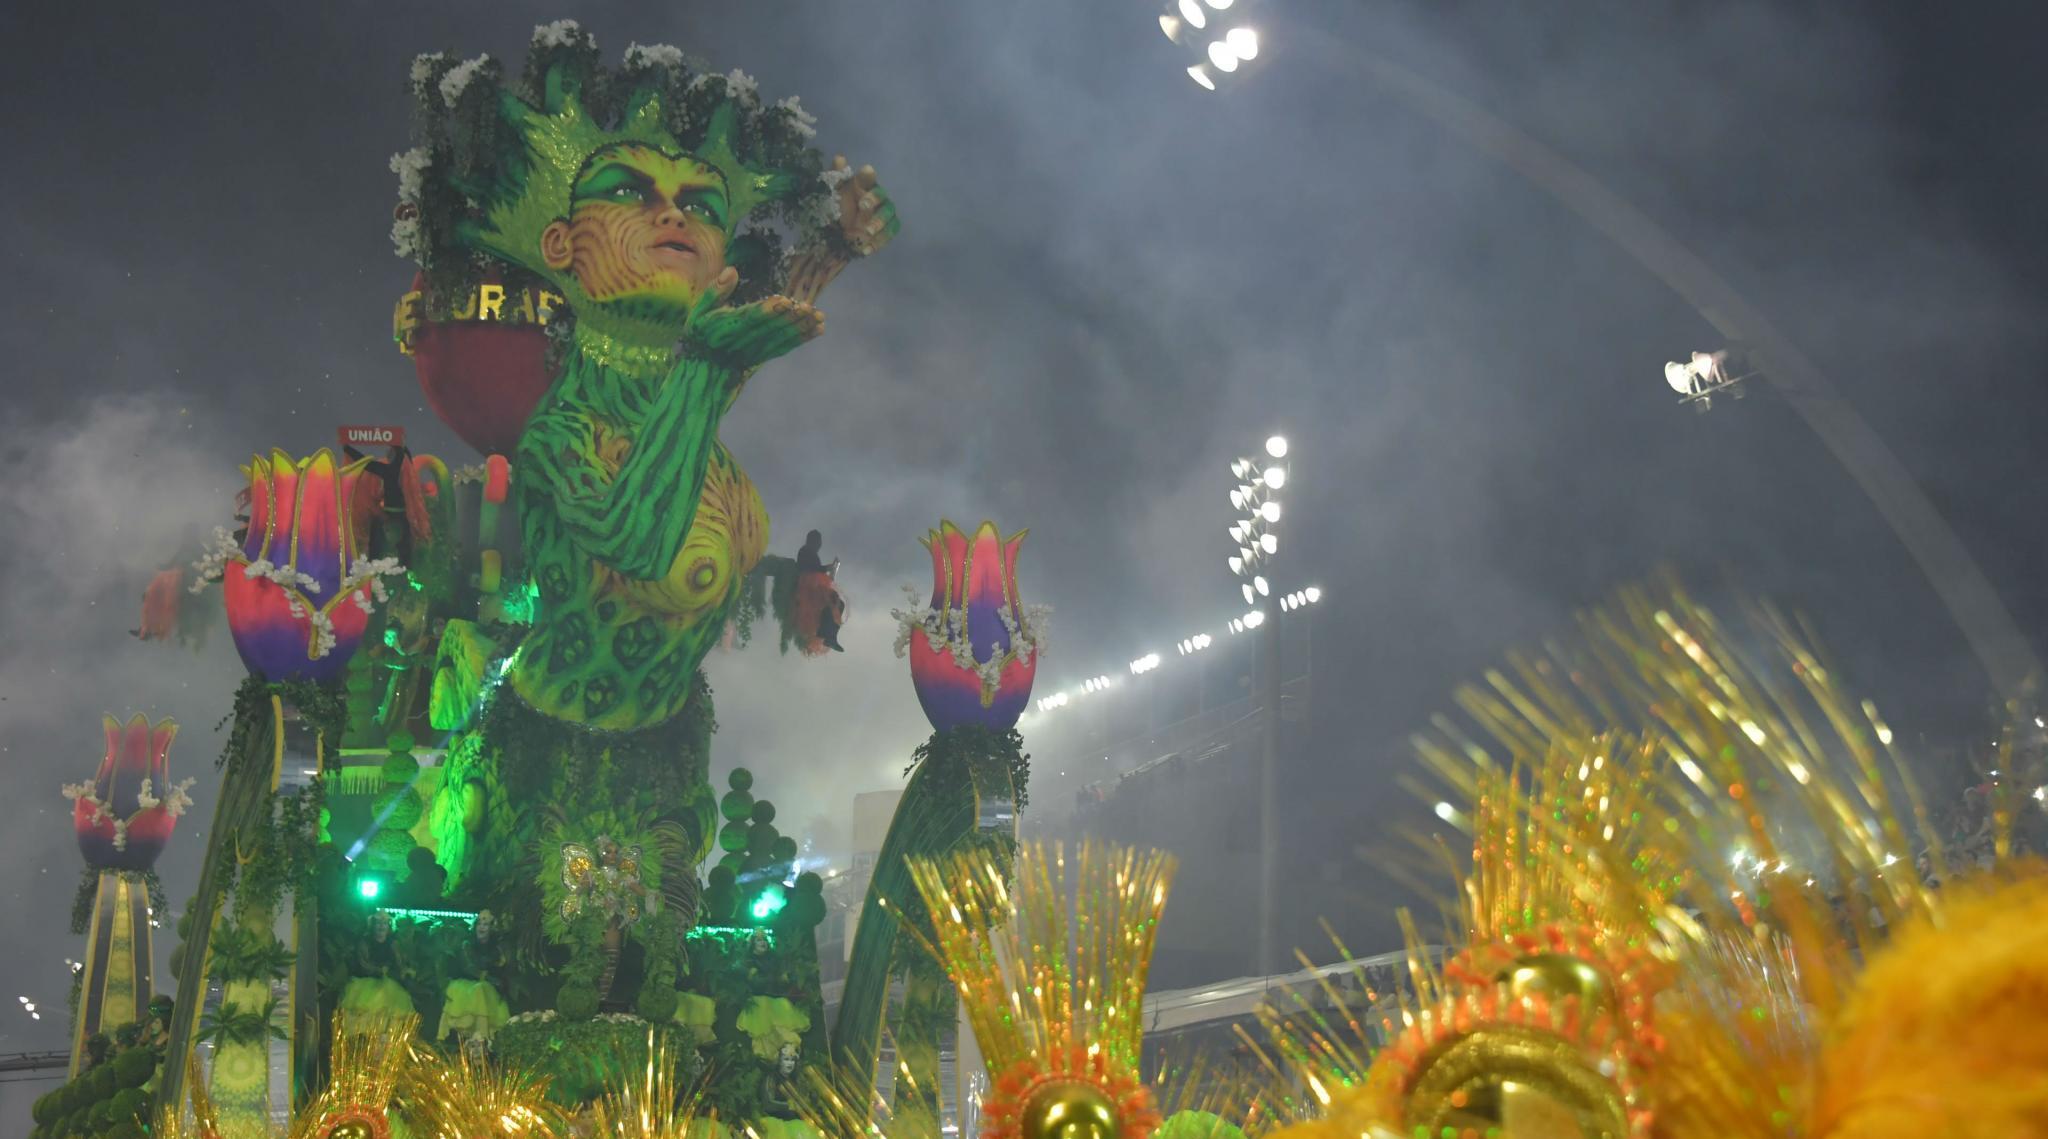 Brazil Carnival Queens: Reigning Over Wild Parties Is Hard Work